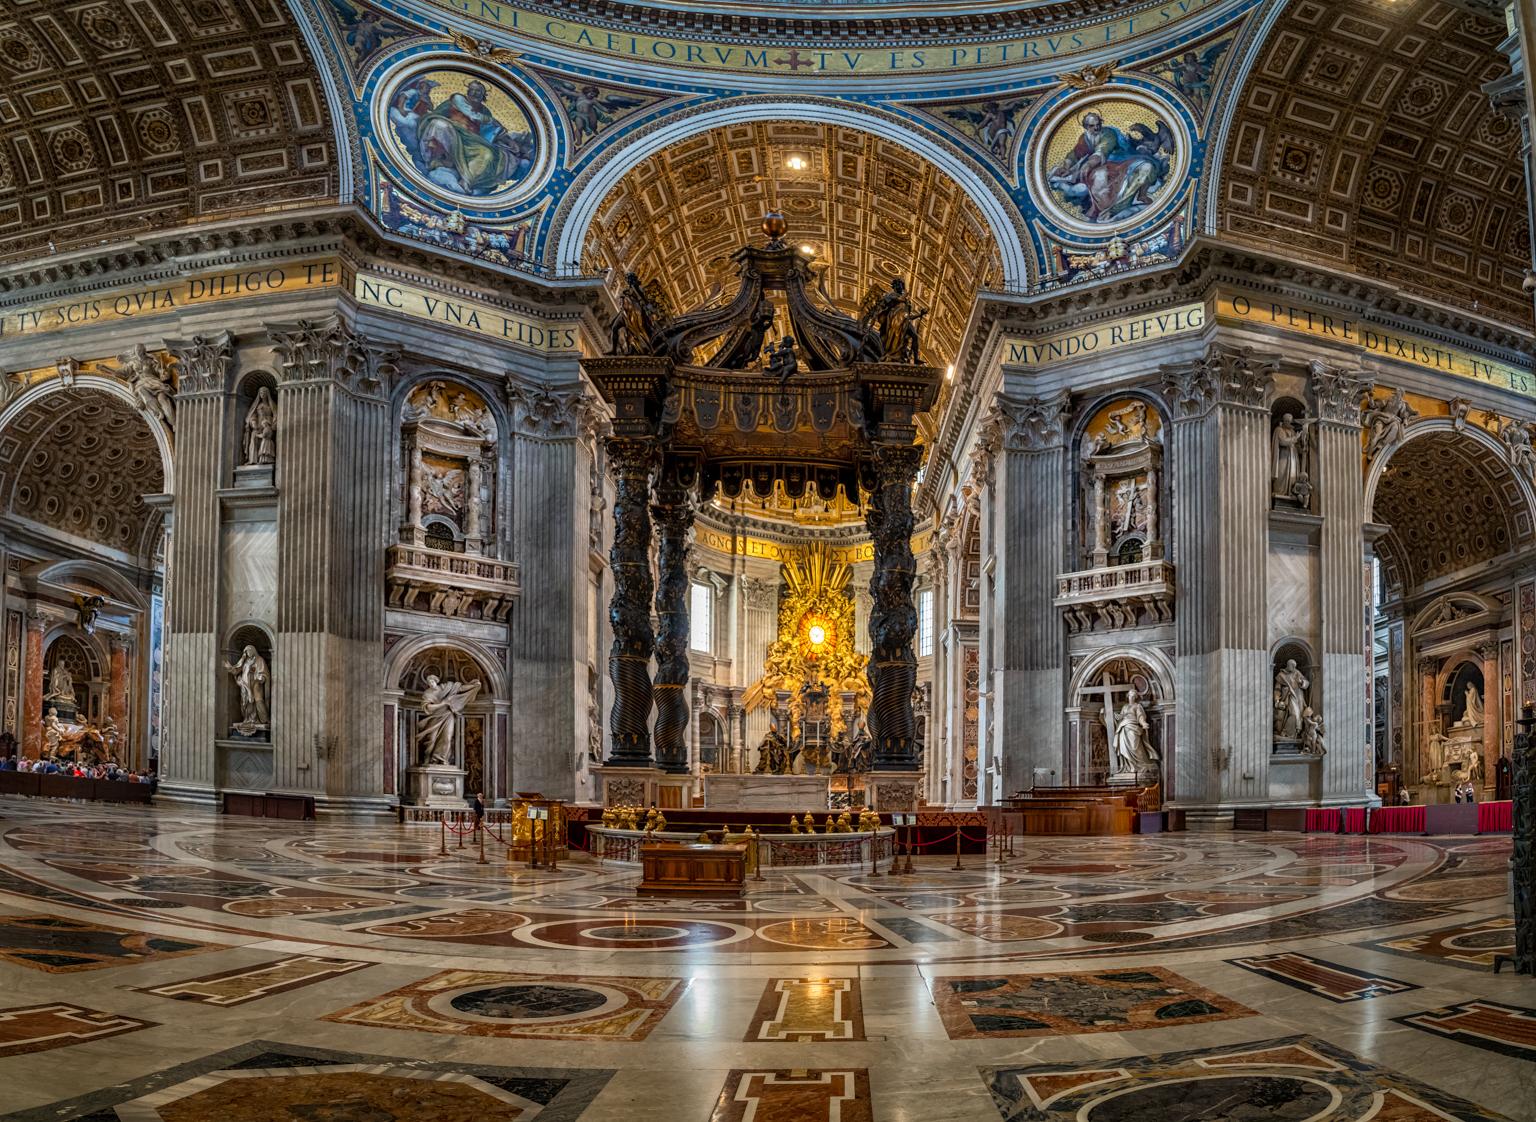 St Peter's Basilica